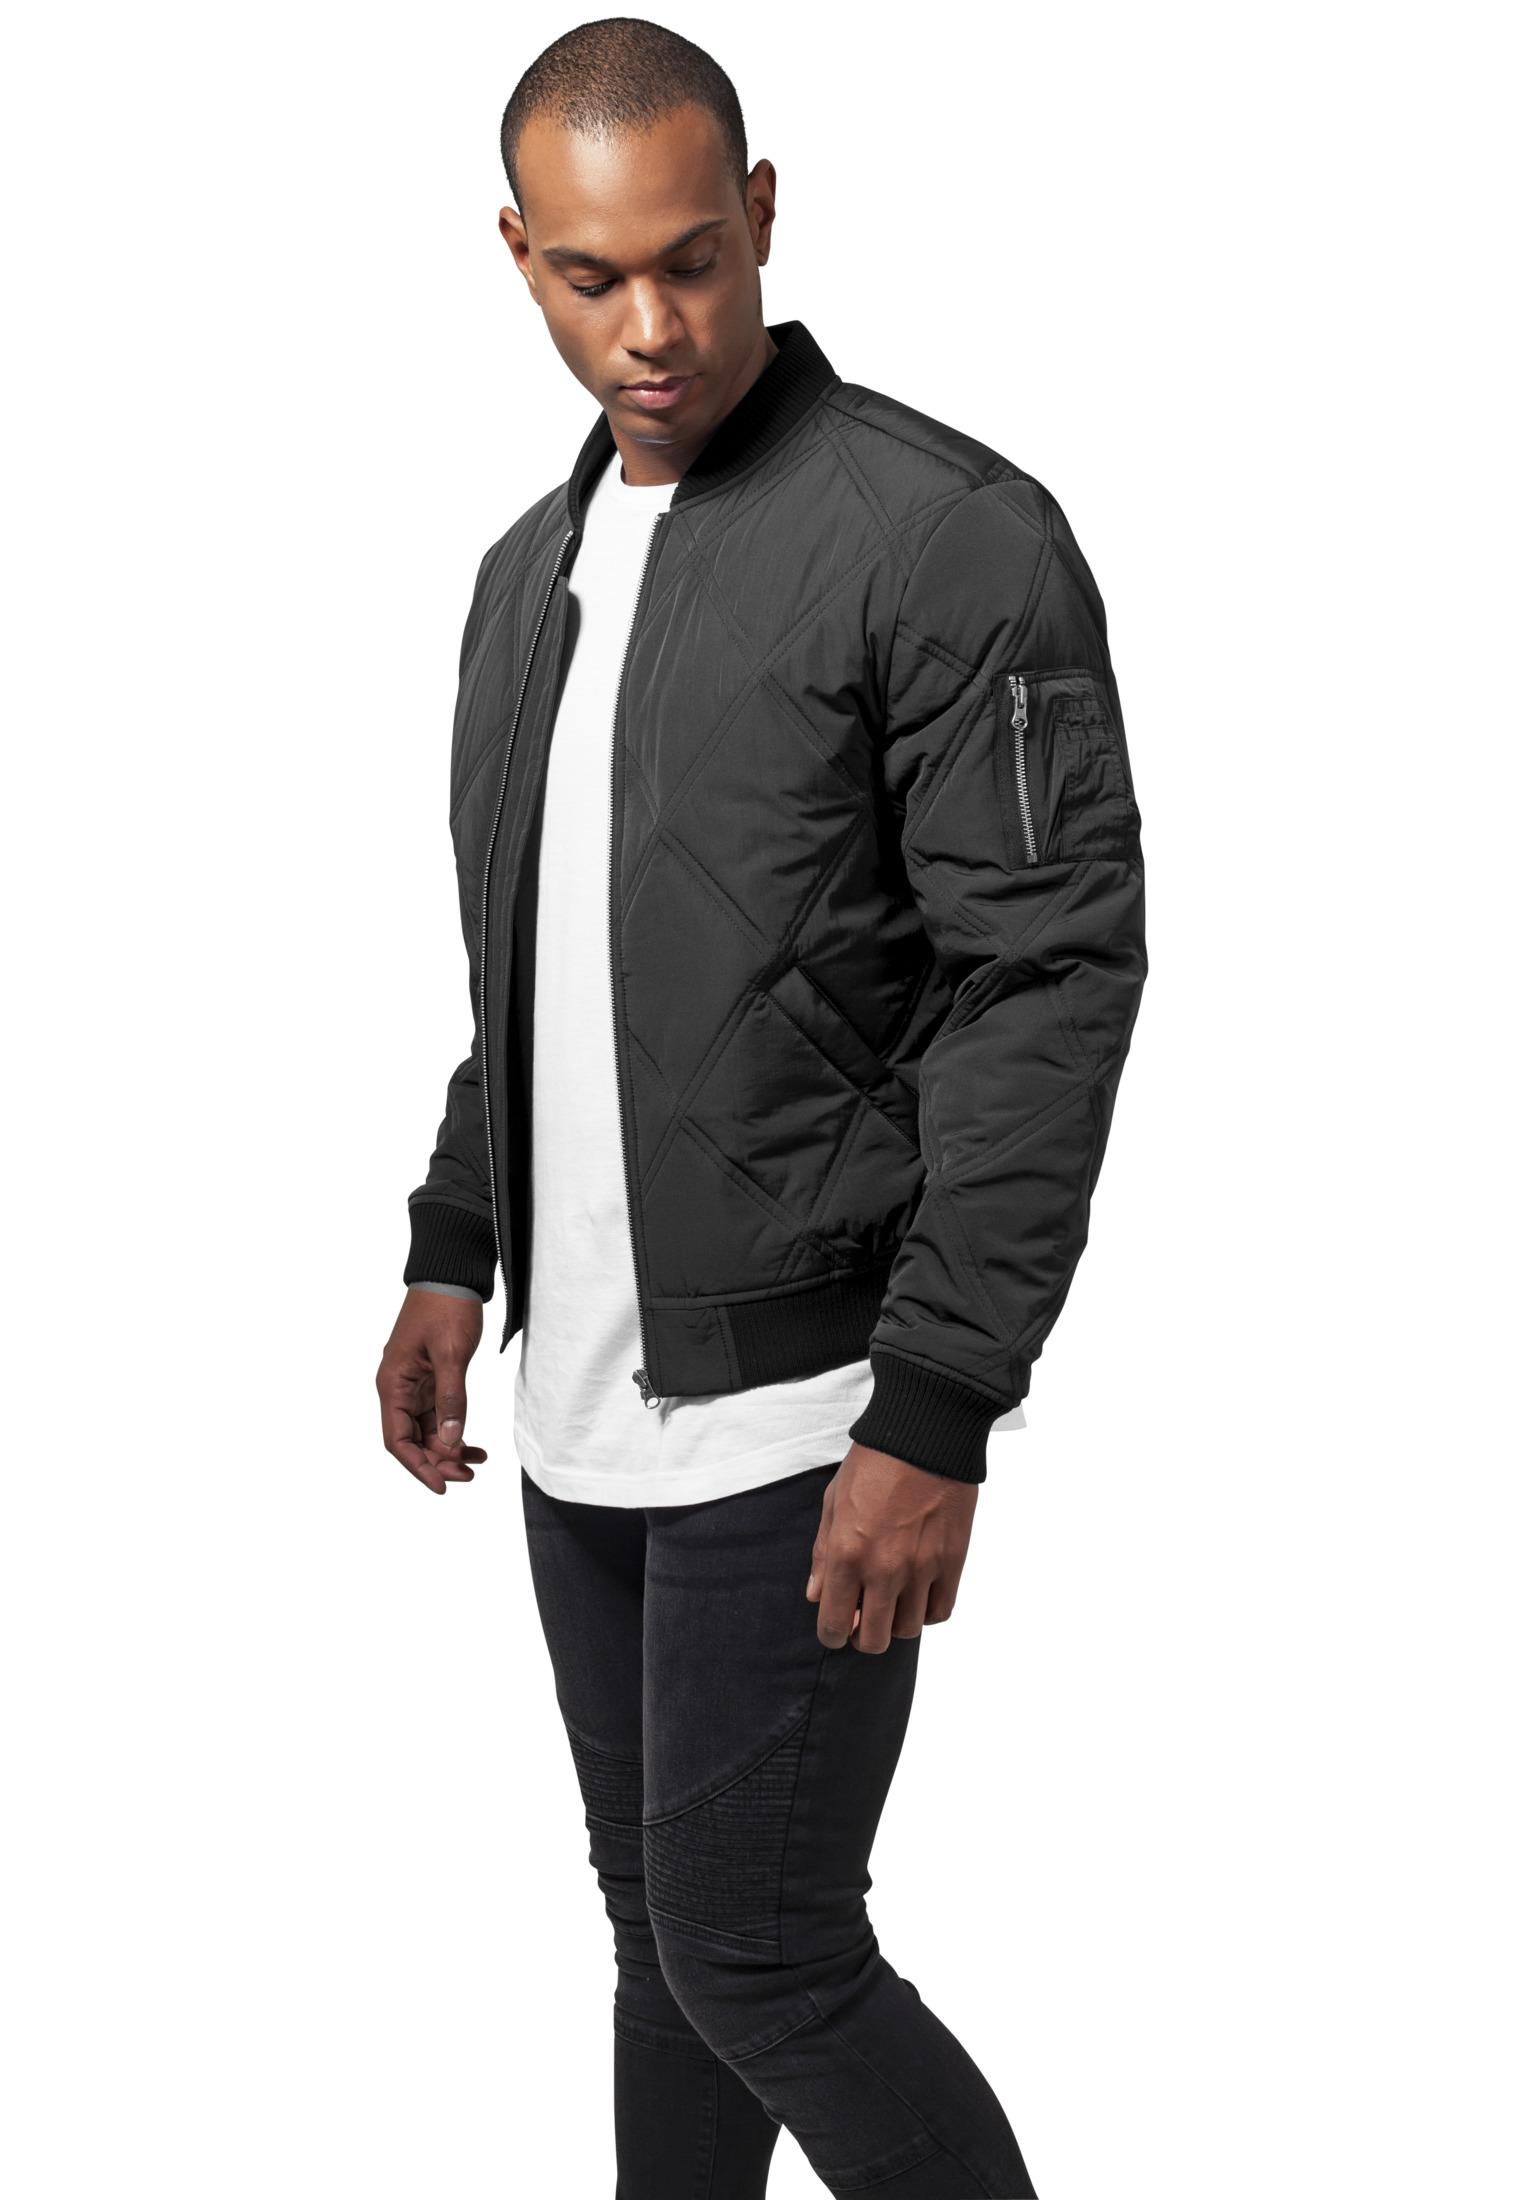 Urban Classics Herren Leichte Jacke Übergangsjacke Oversized Bomber Jacket